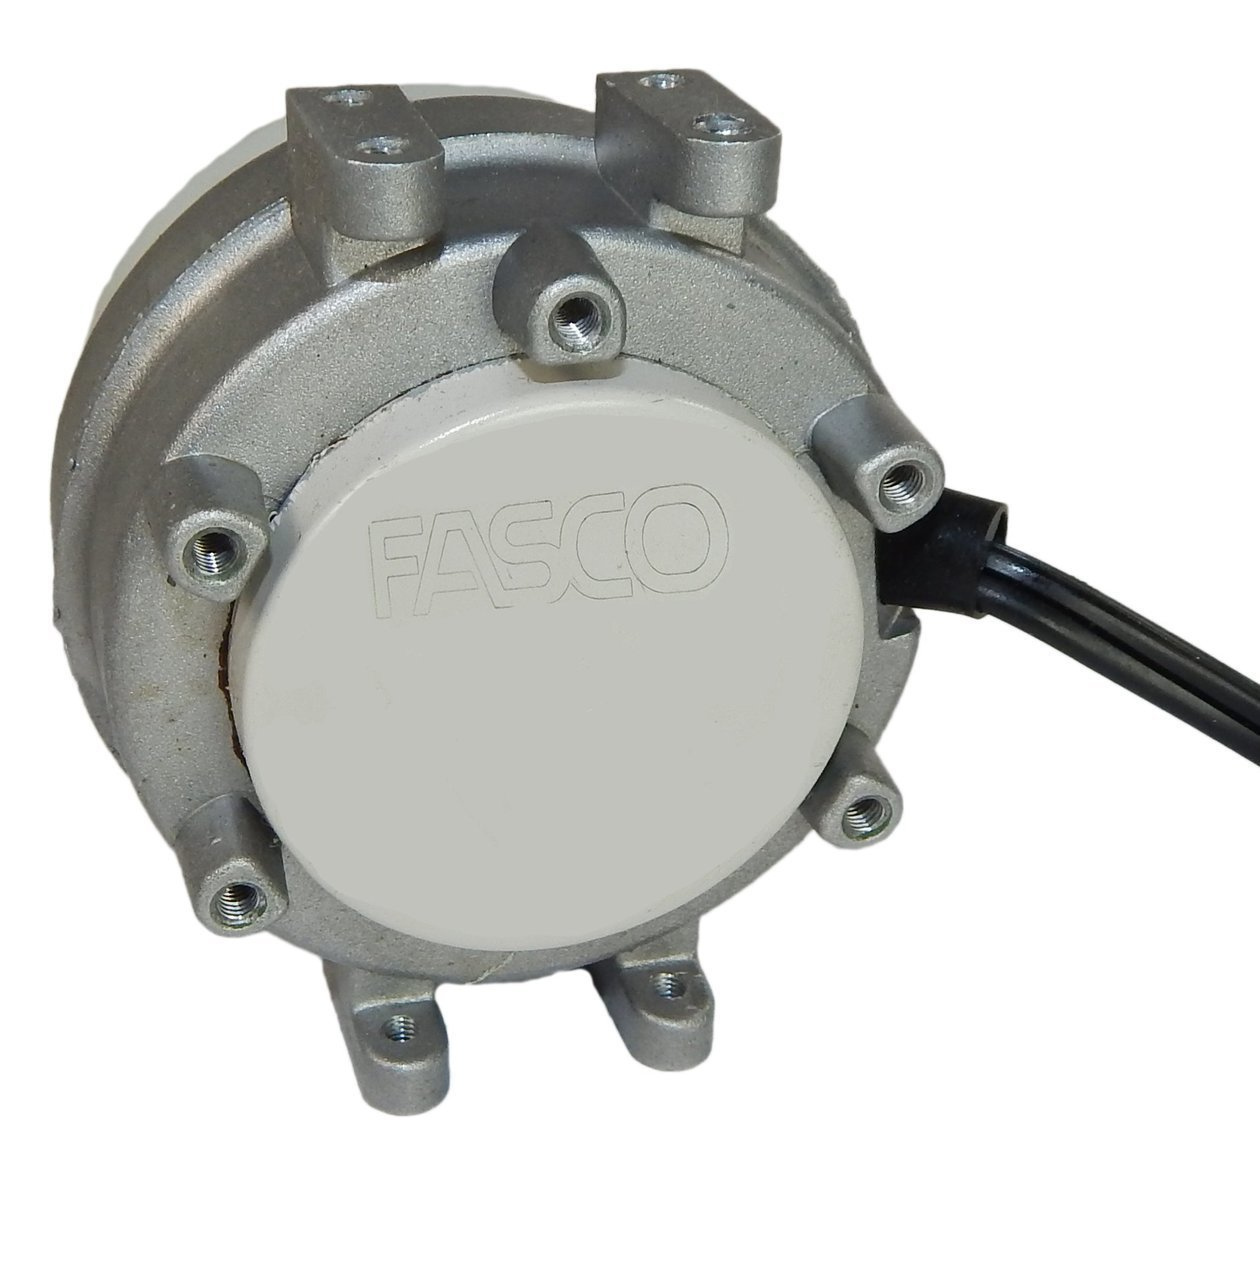 Fasco D559 6 Watt 115 Volt Unit Bearing / Watt Motor w/ CCW Rotation Replaces 5313 - D559